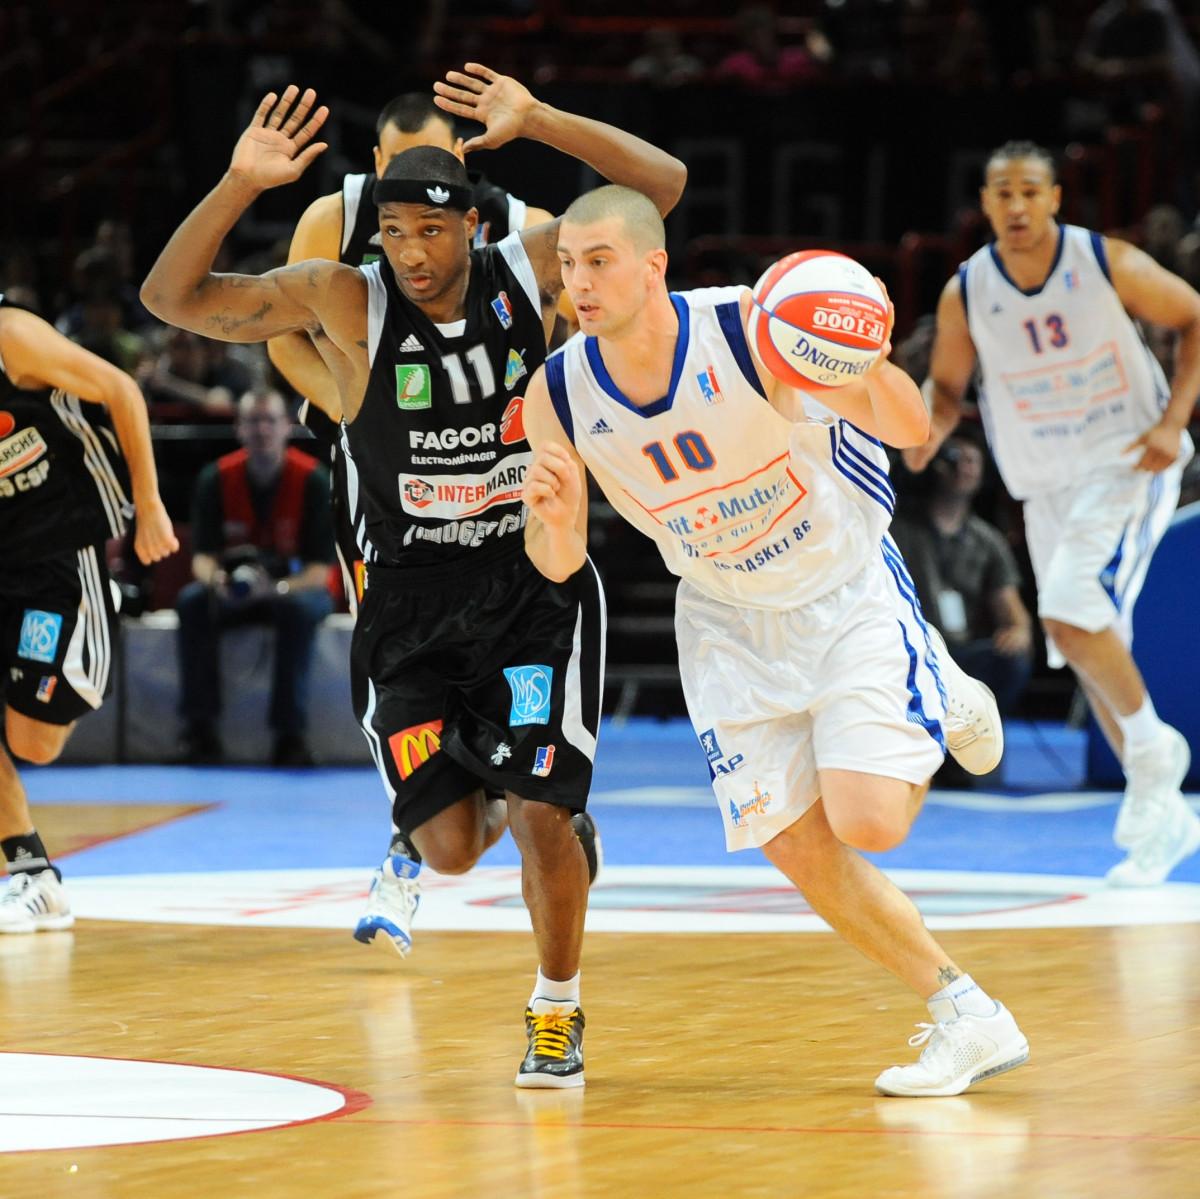 Photo of Guillaume Costentin, 2008-2009 season